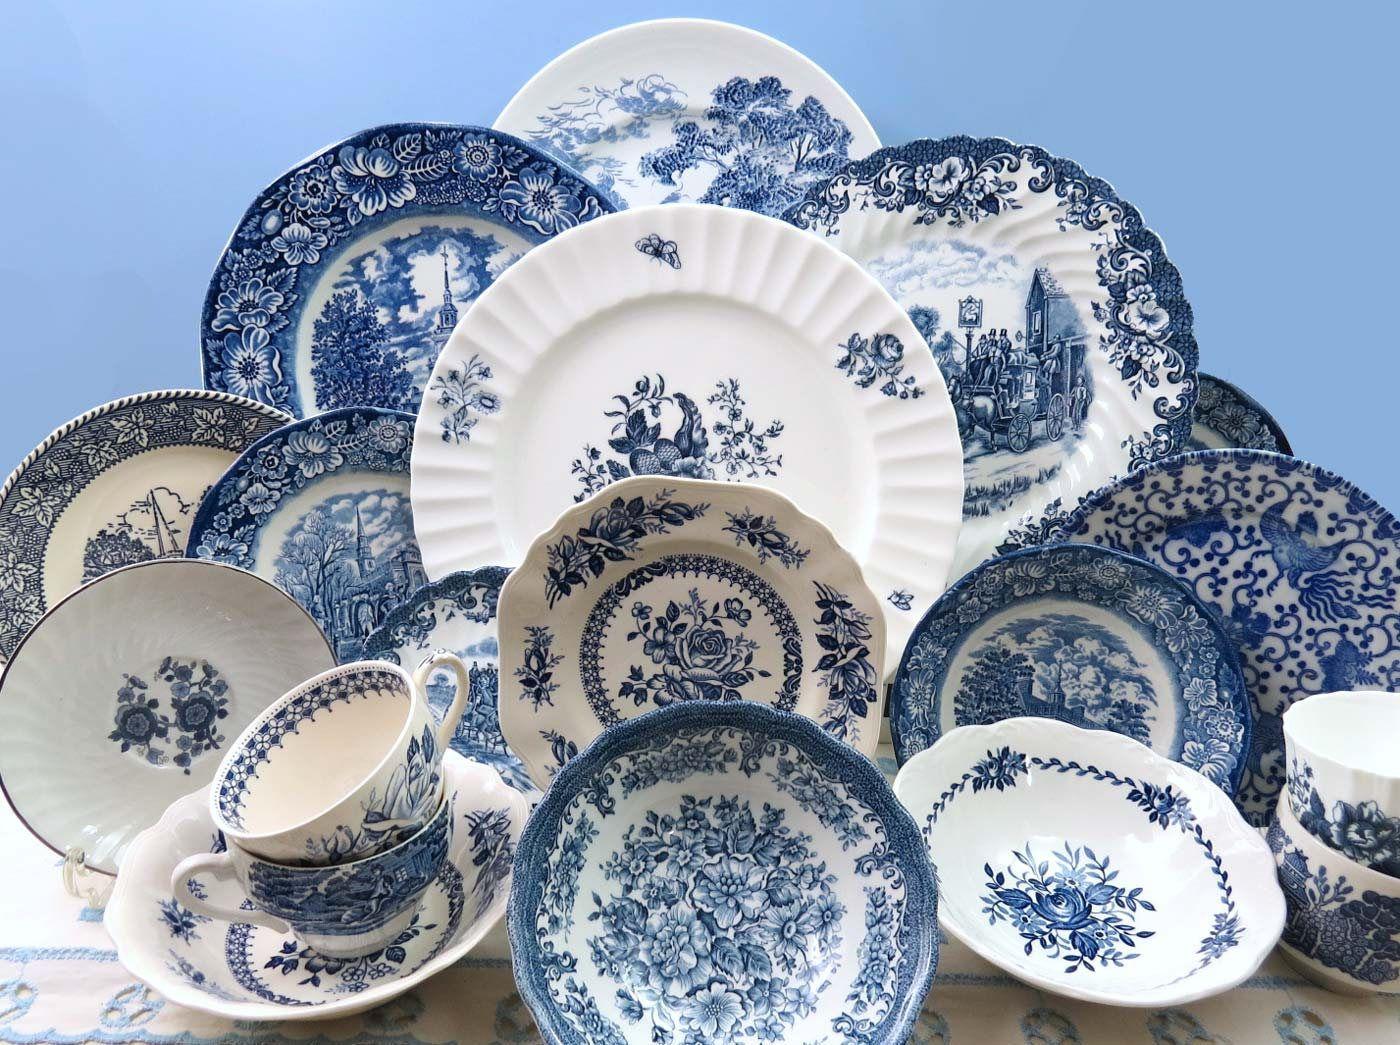 20 Piece Vintage Mismatched Blue White Ironstone China